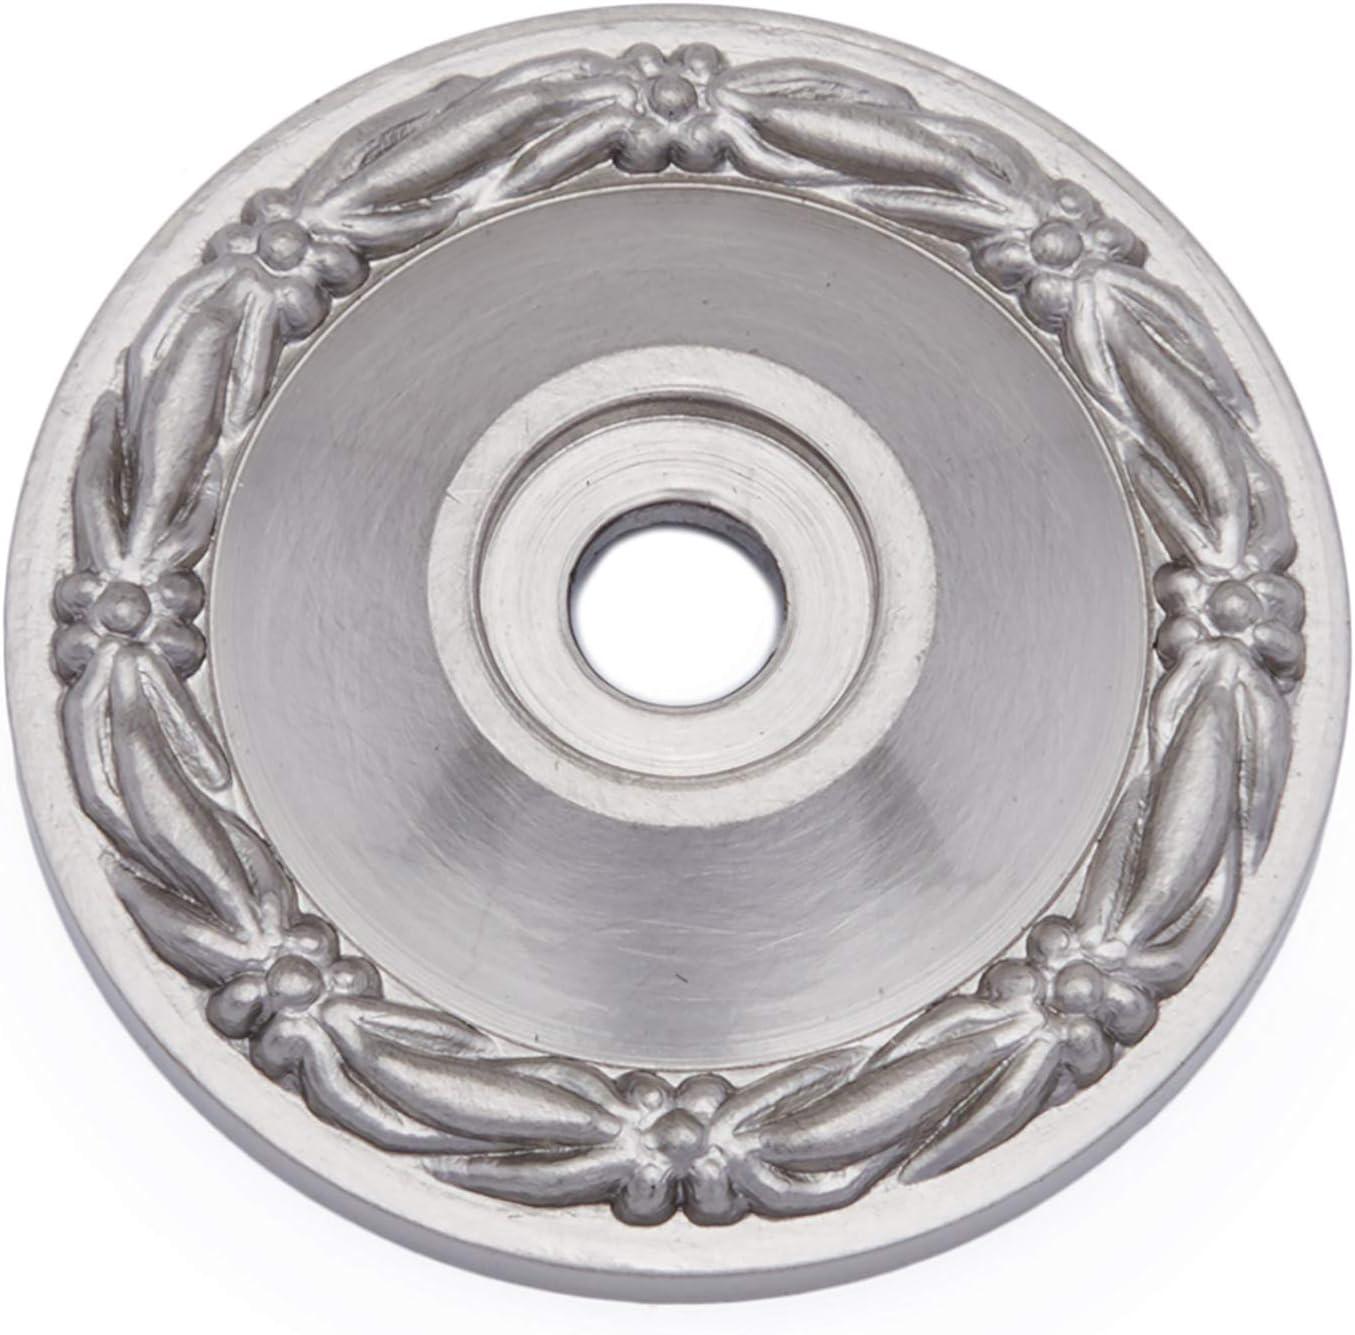 RK International RKI Satin Nickel (Pewter) R.K. International BP 489 P Flat Deco-Leaf Knob Backplate